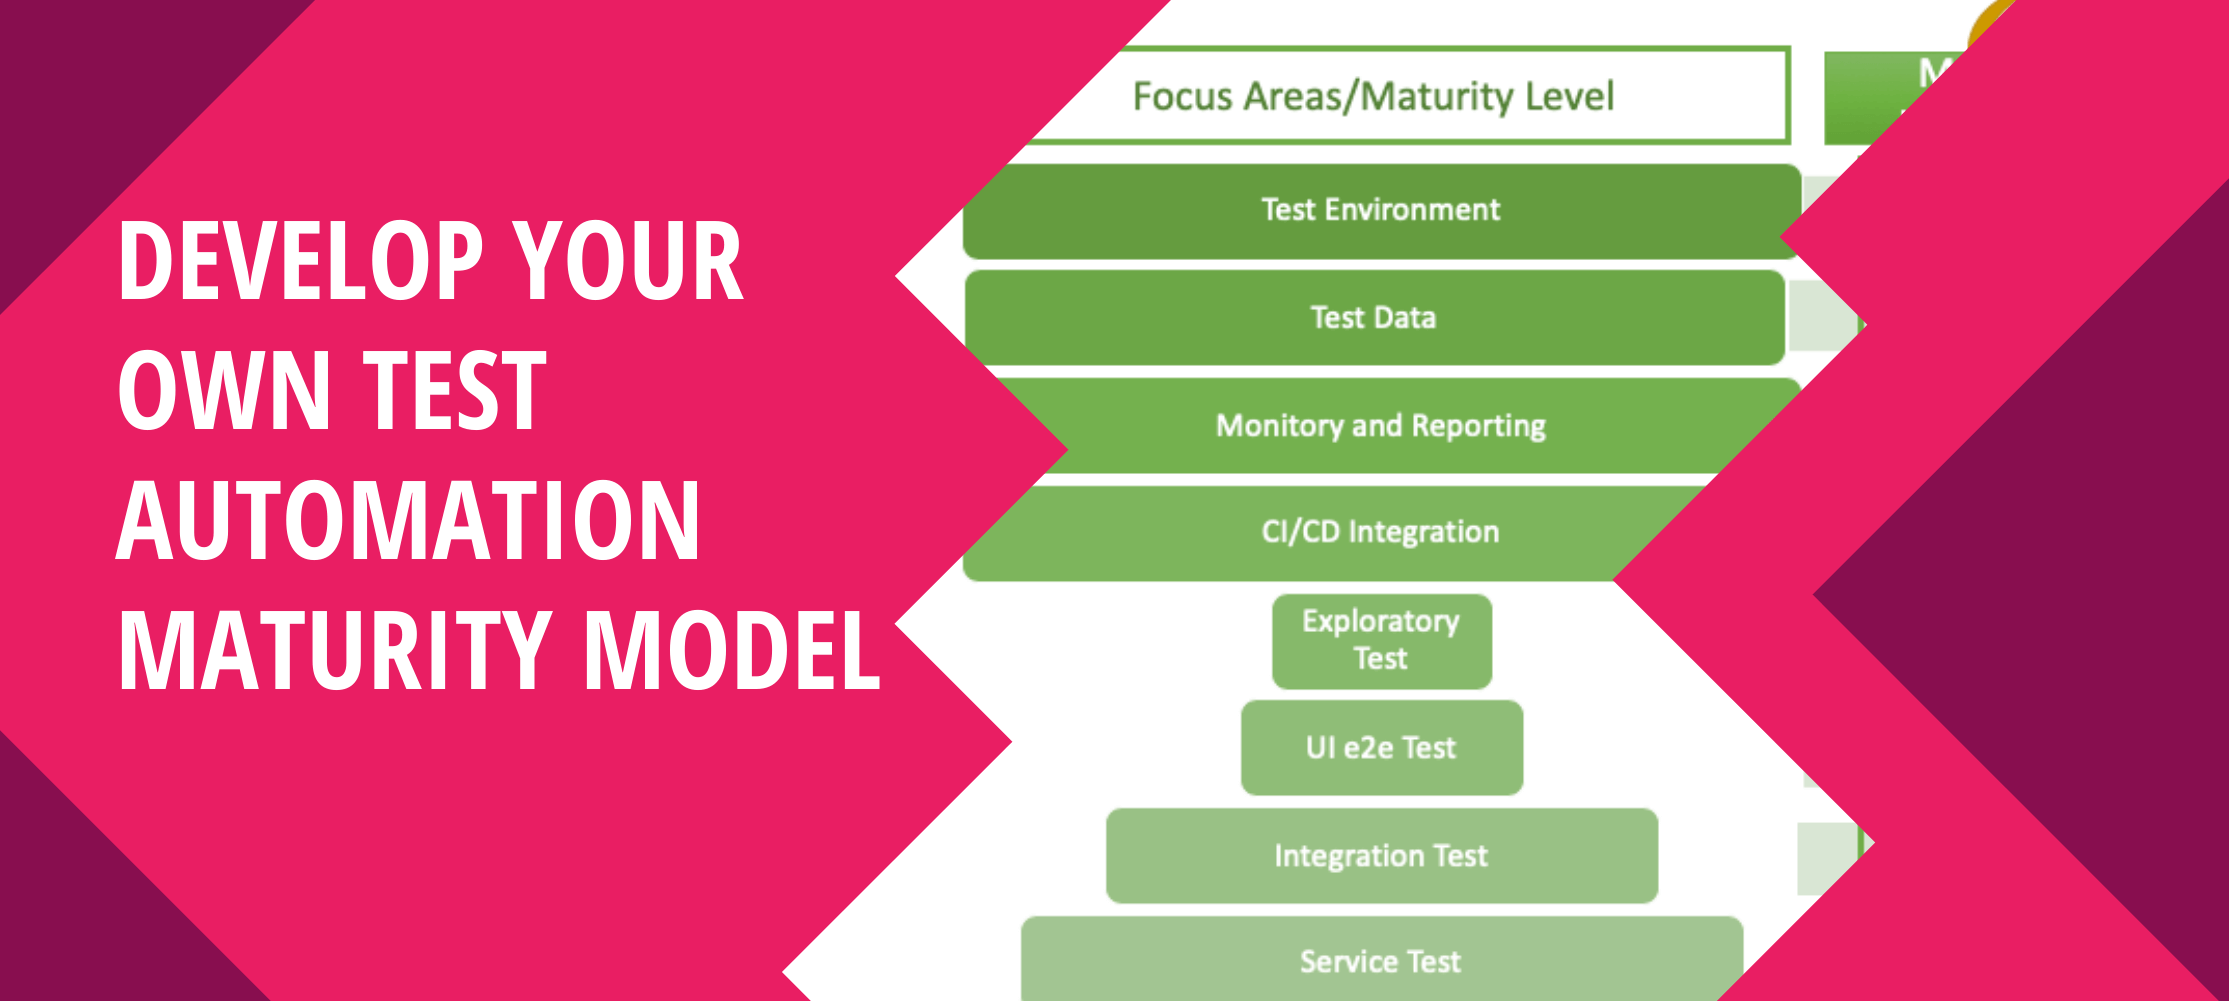 Entwickle dein eigenes Test Automation Maturity Model